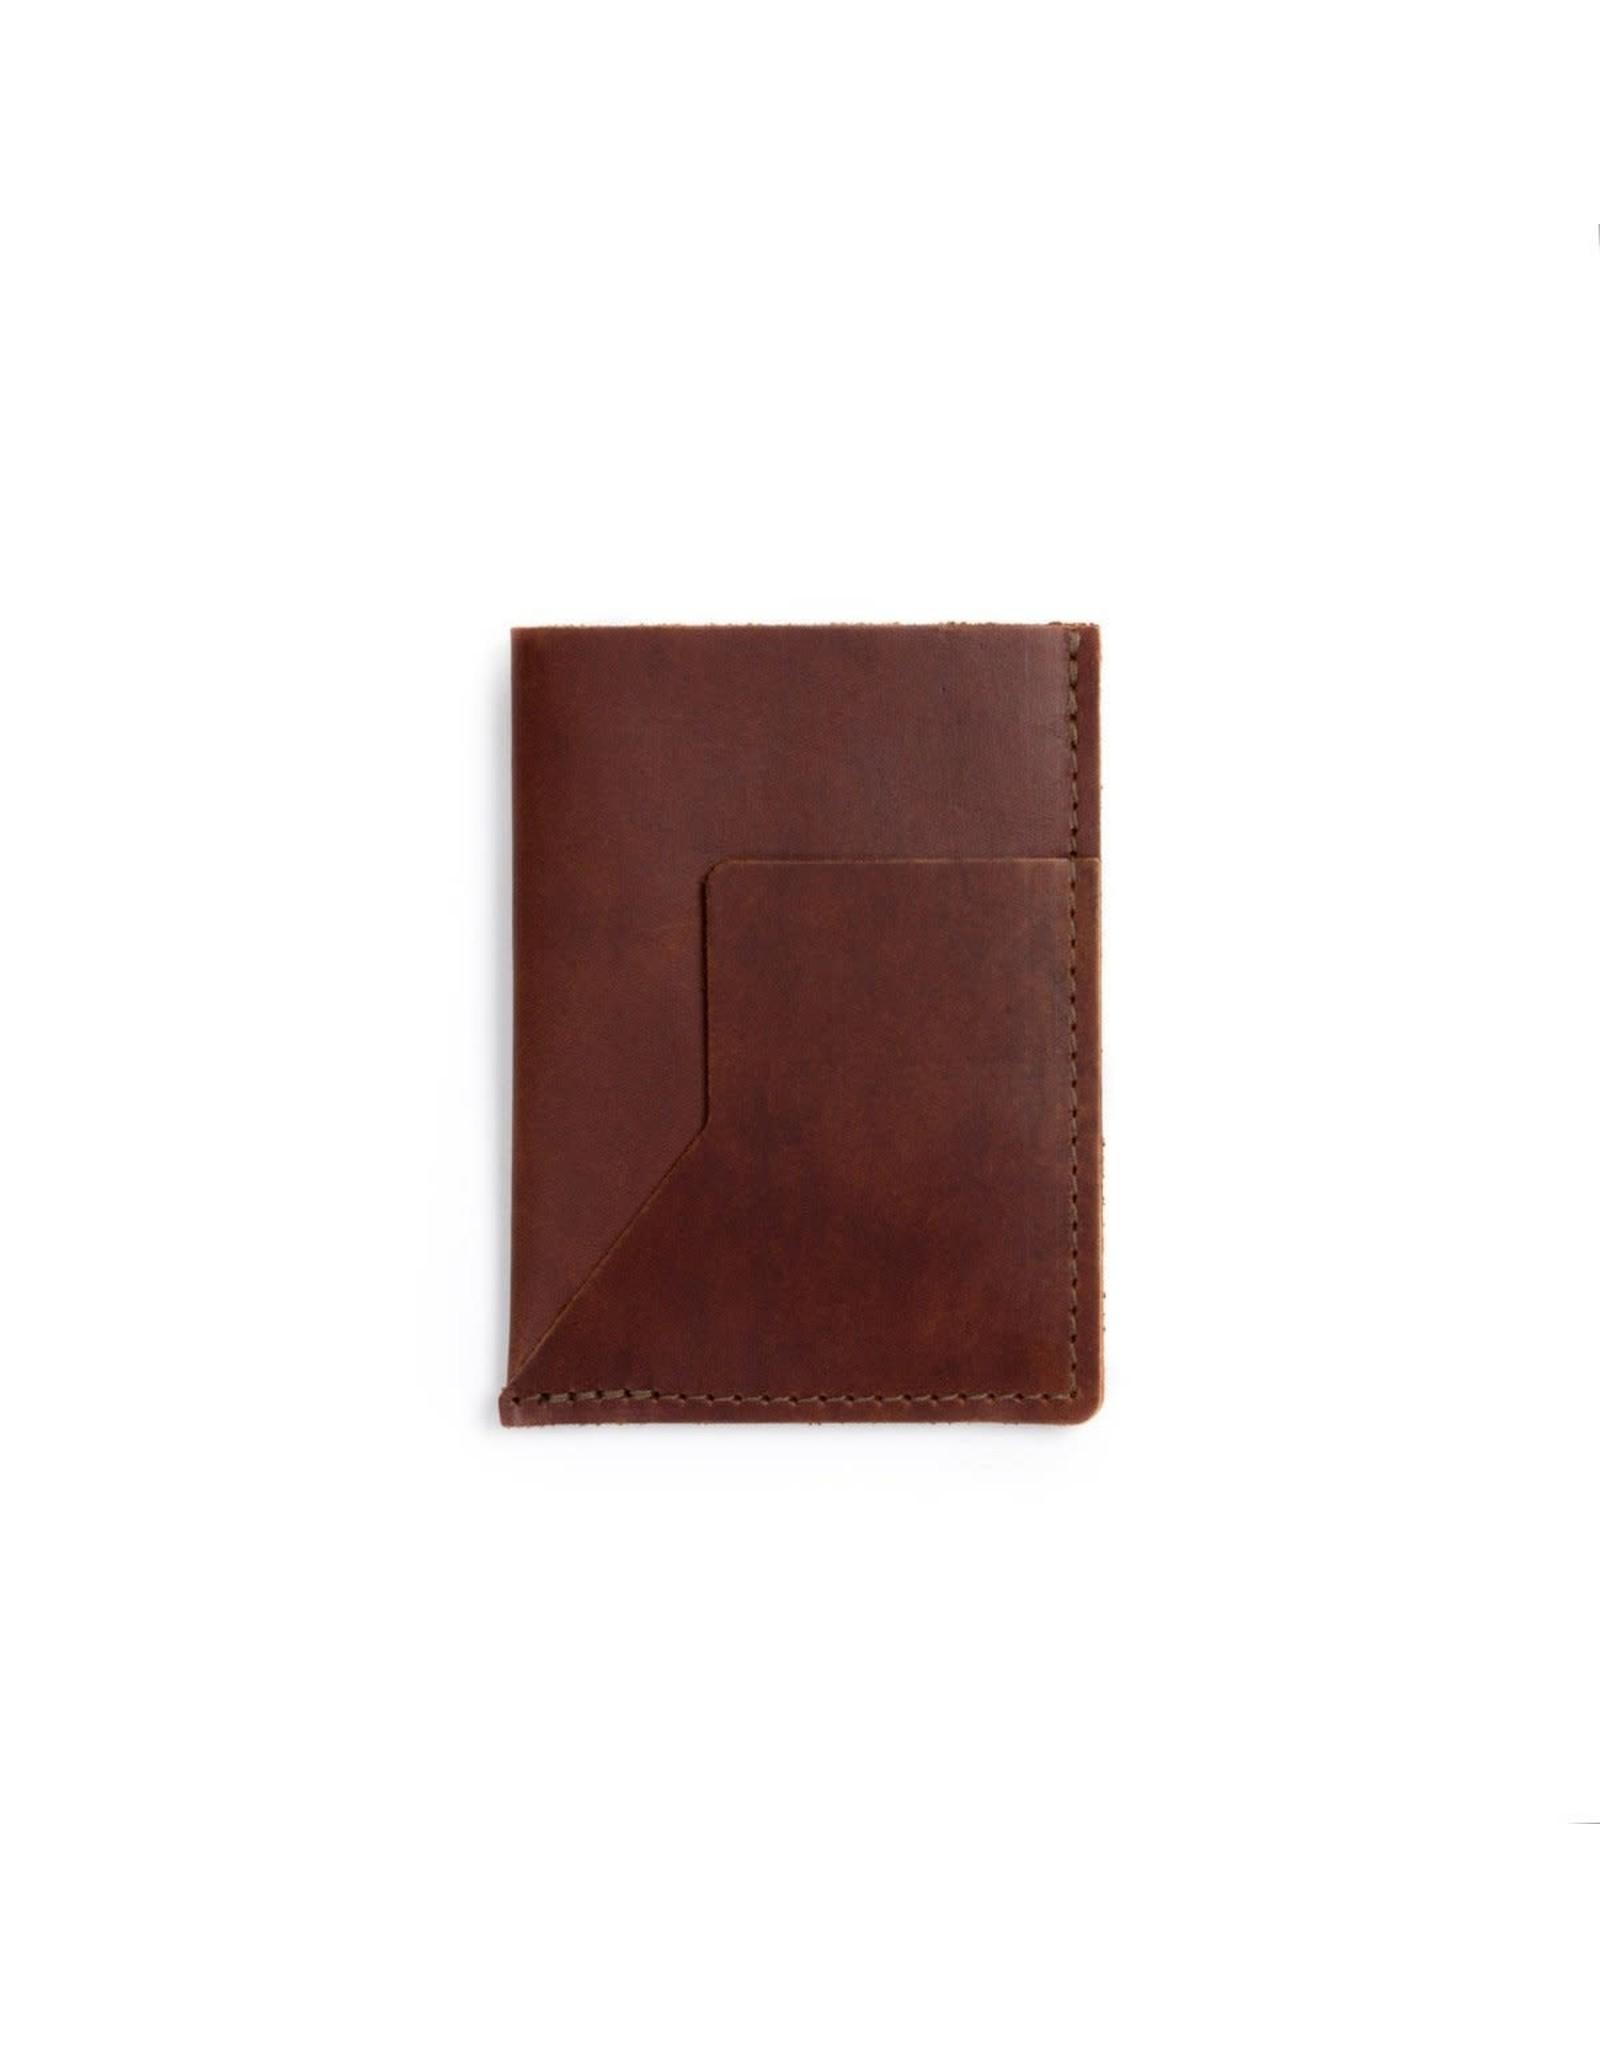 Rustico Rustico Passport Sleeve